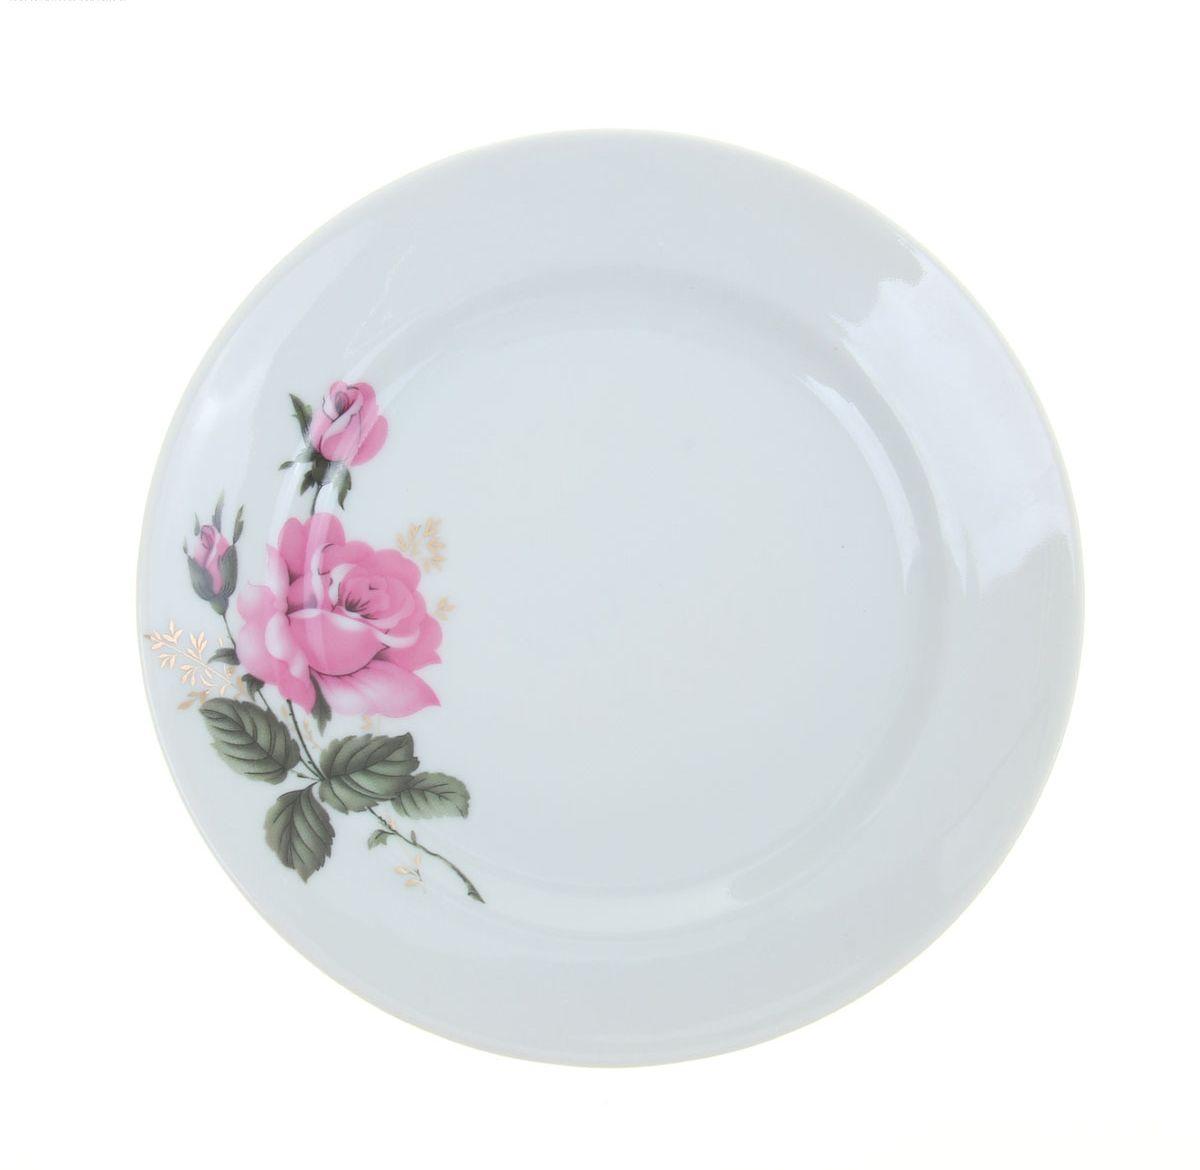 Тарелка мелкая Идиллия. Глория, диаметр 17 см1035455/4С0336